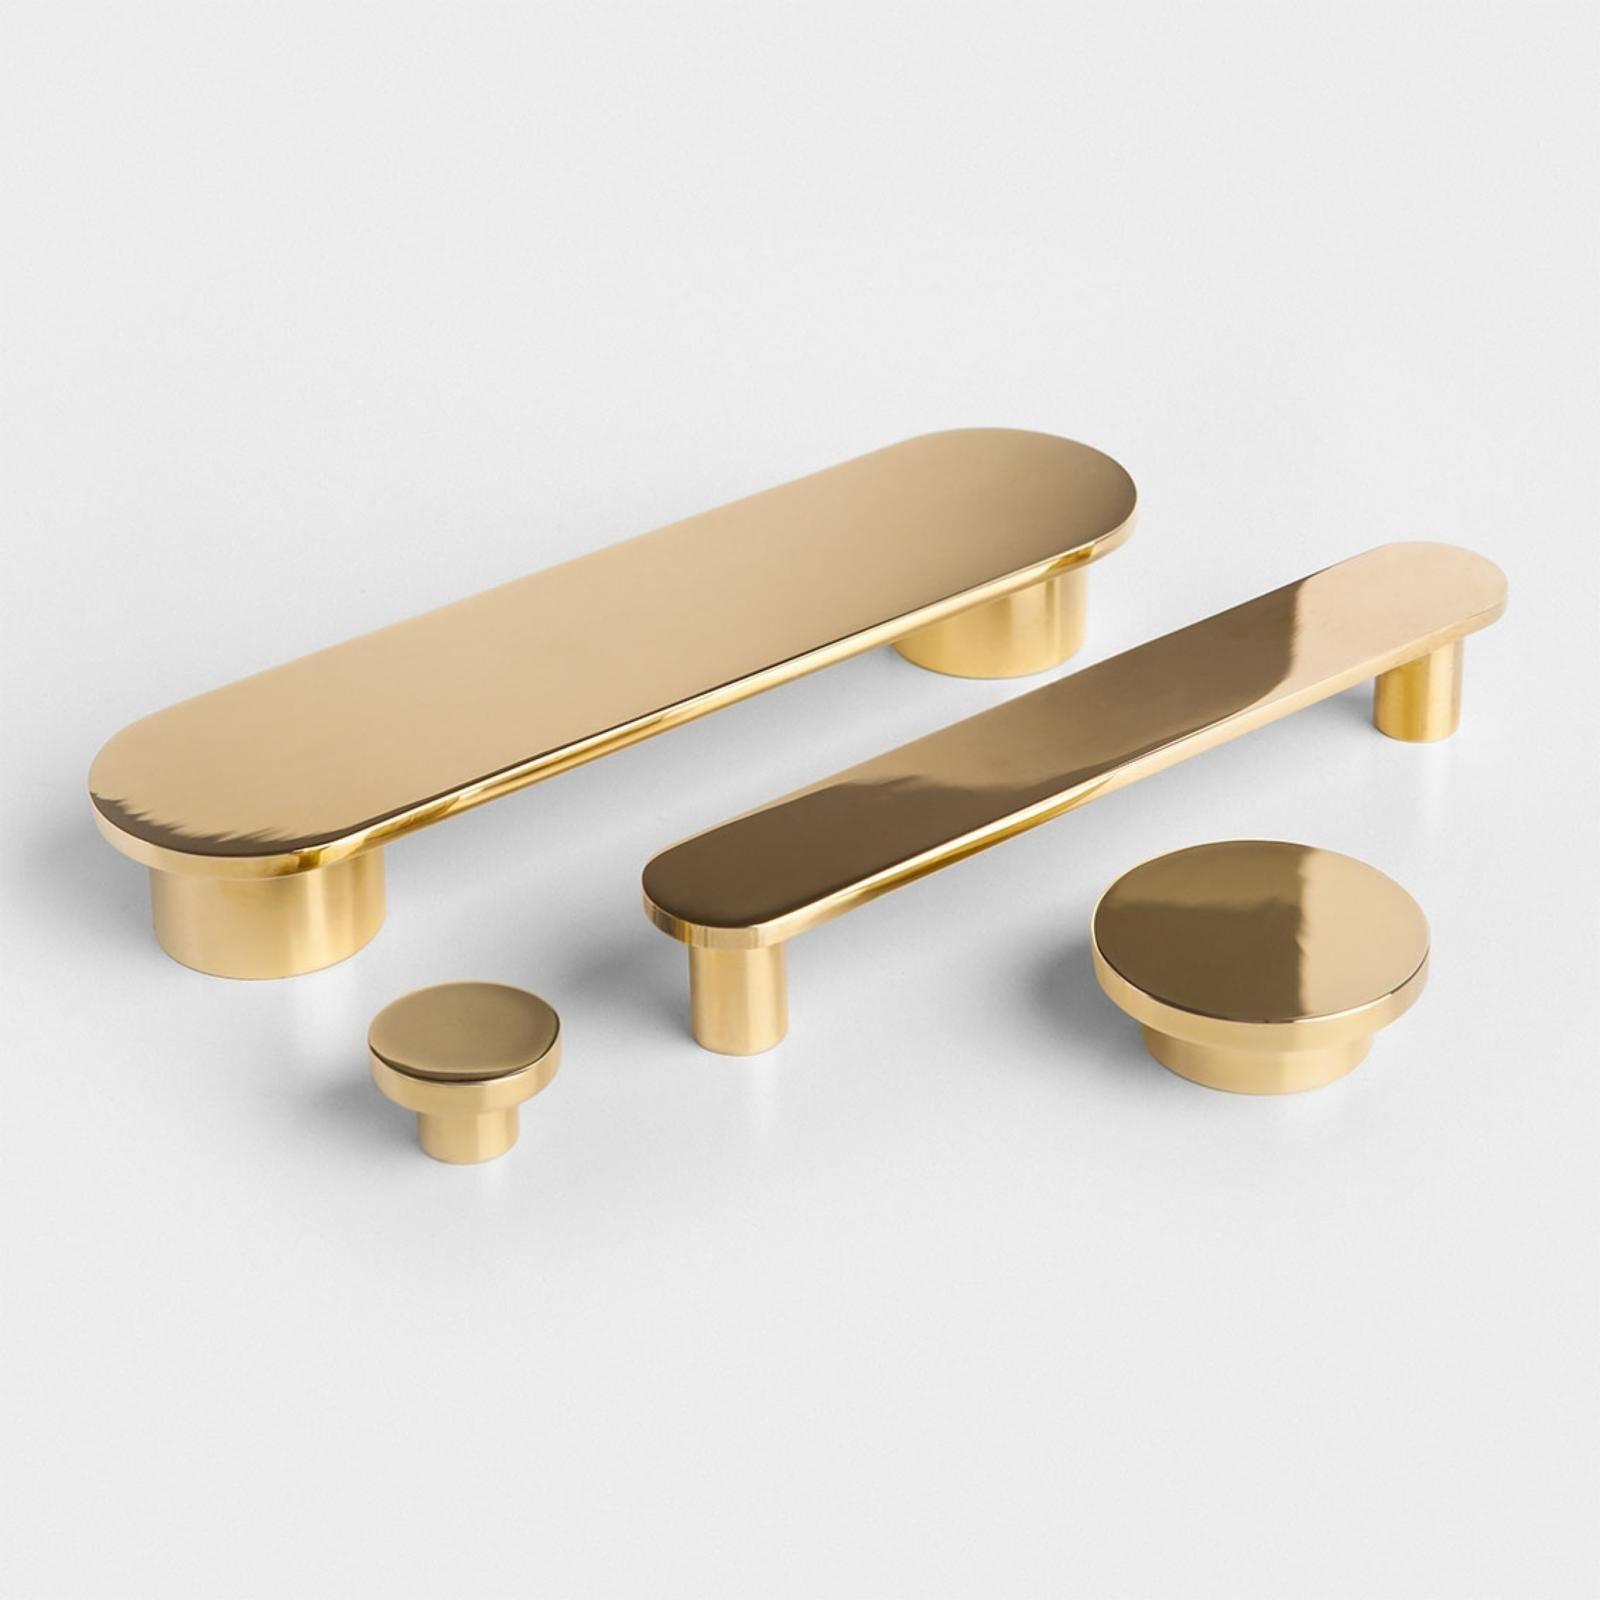 Circus Furniture Handles In Genuine Solid Materials Superfront Furniture Handles Brass Kitchen Handles Bespoke Handles